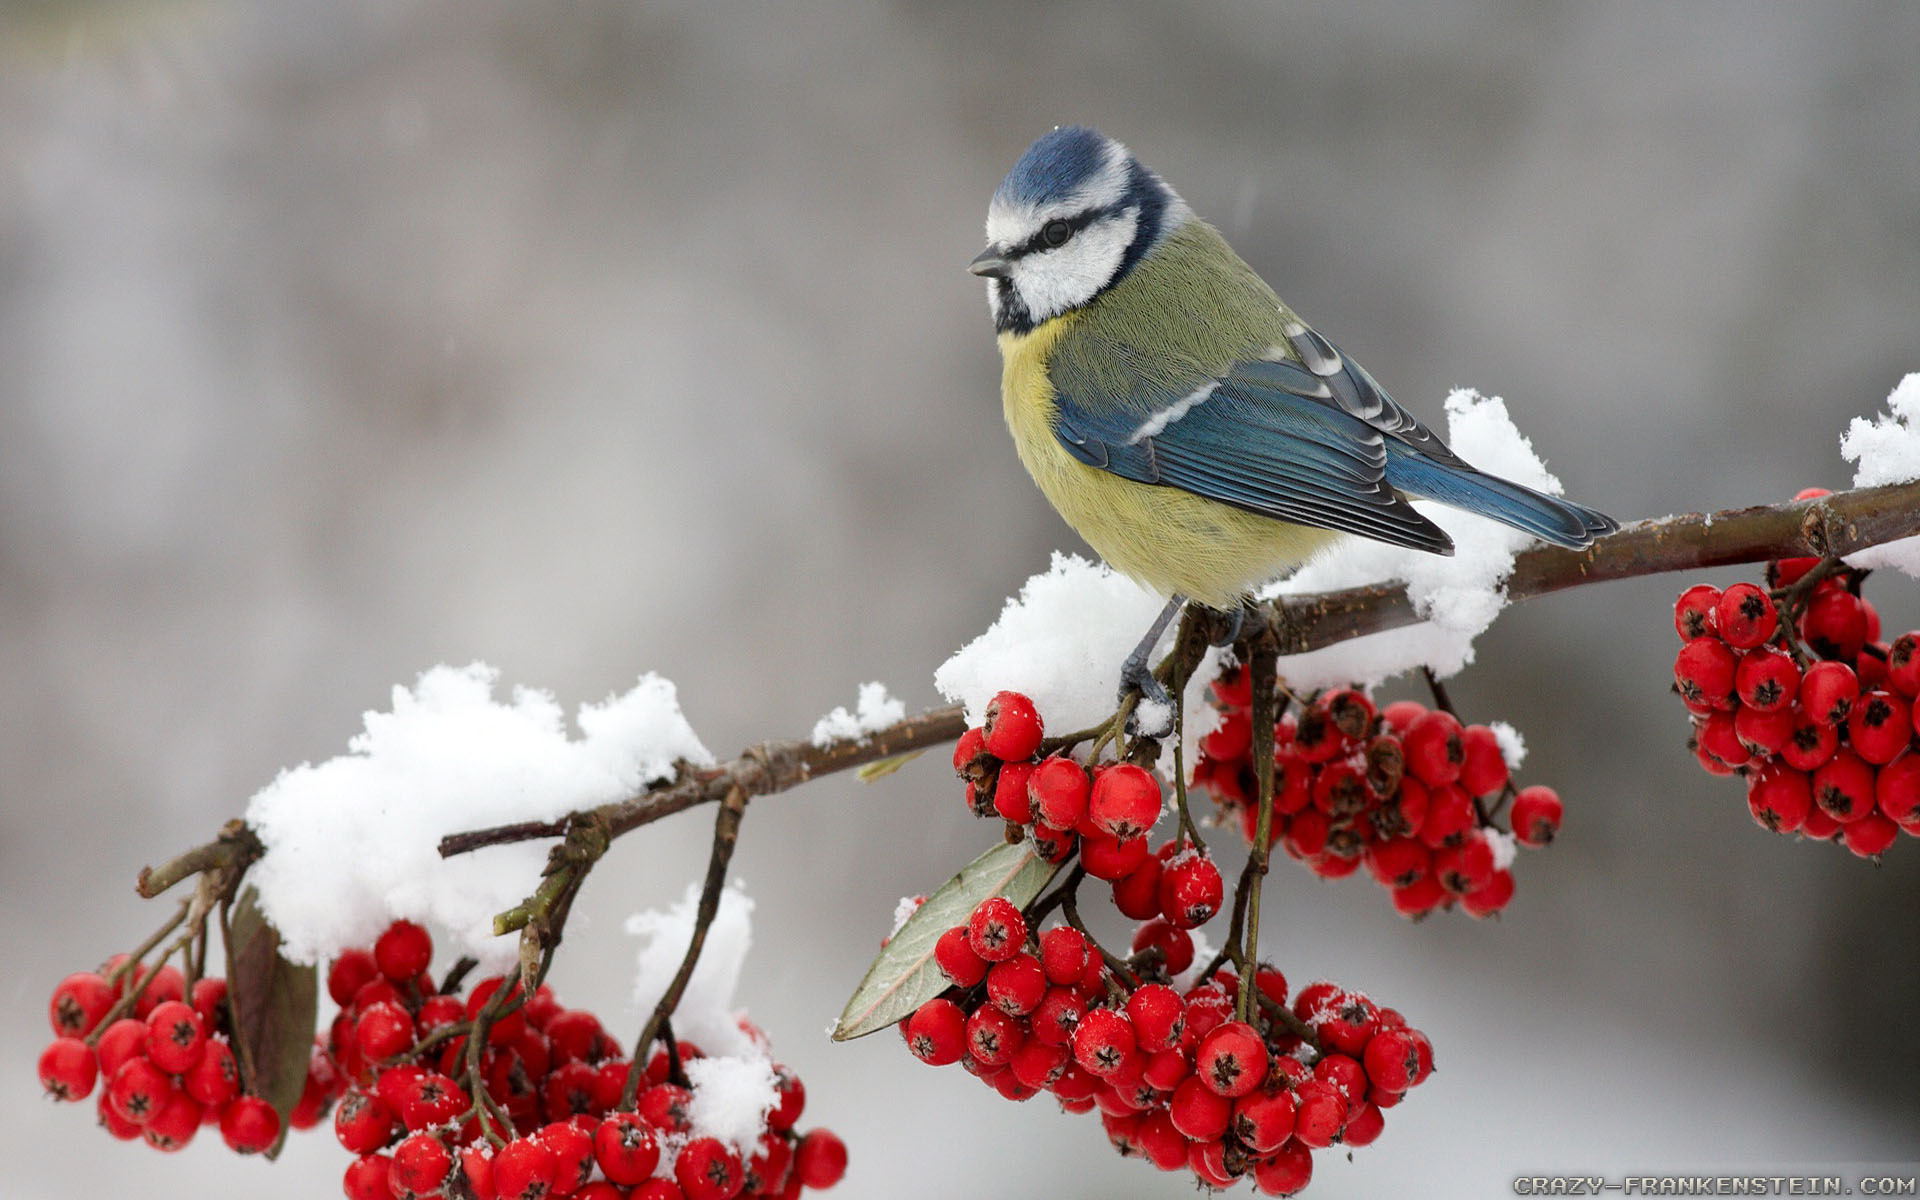 Winter bird images - photo#34